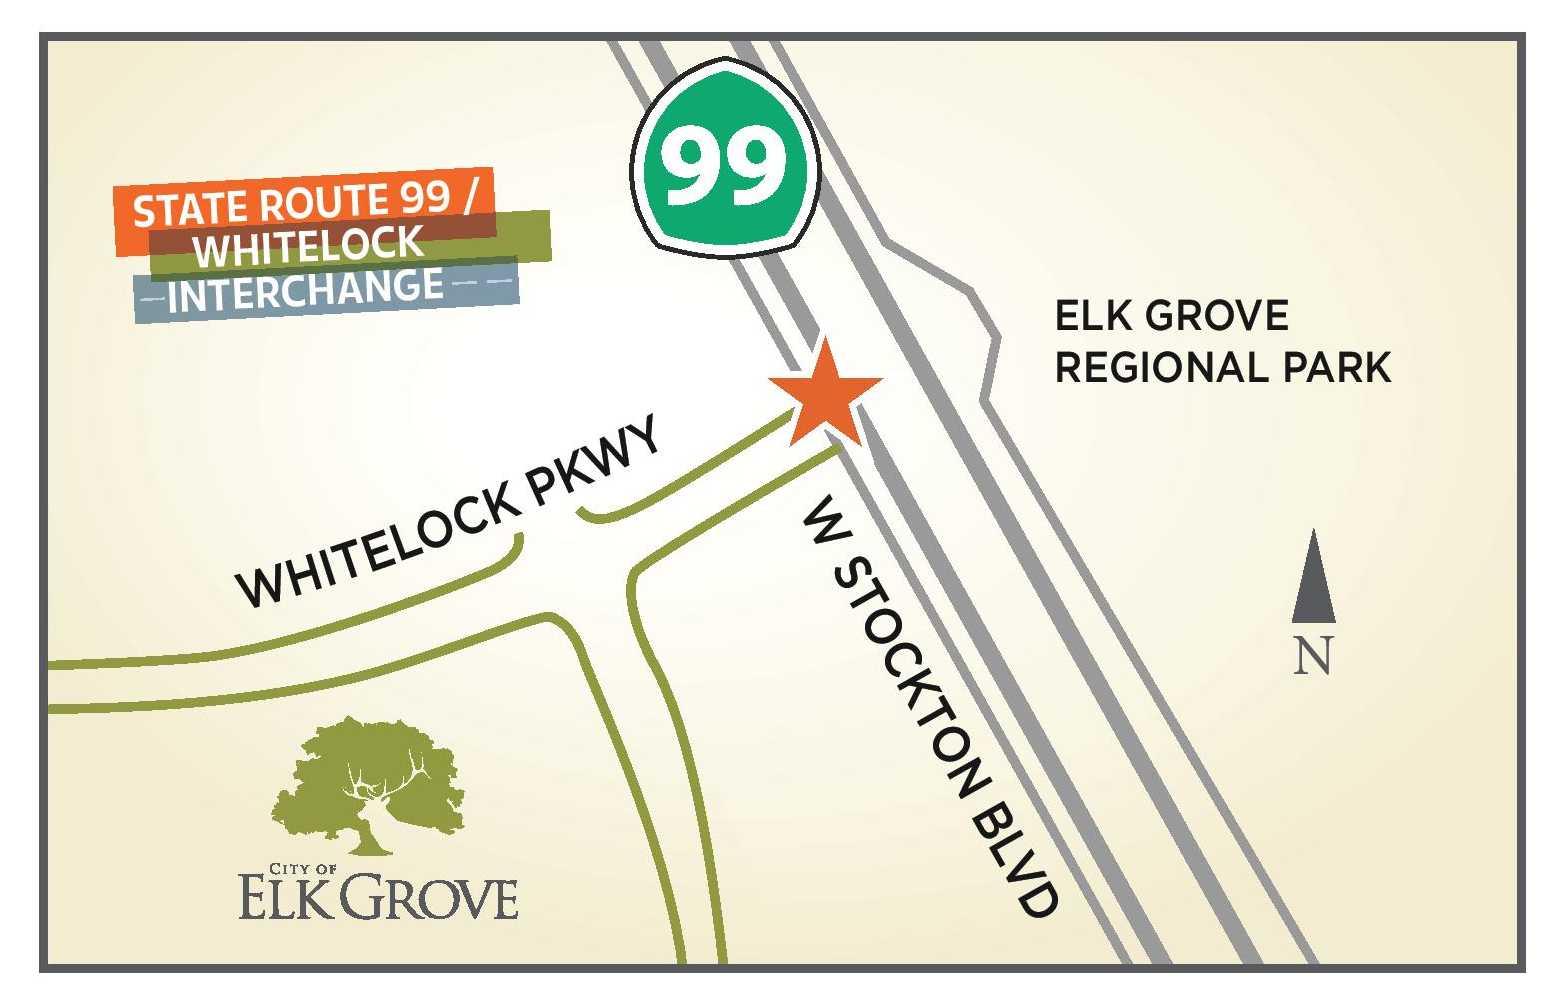 Elk Grove Releases Preliminary Information on Proposed Whitelock-99 Interchange